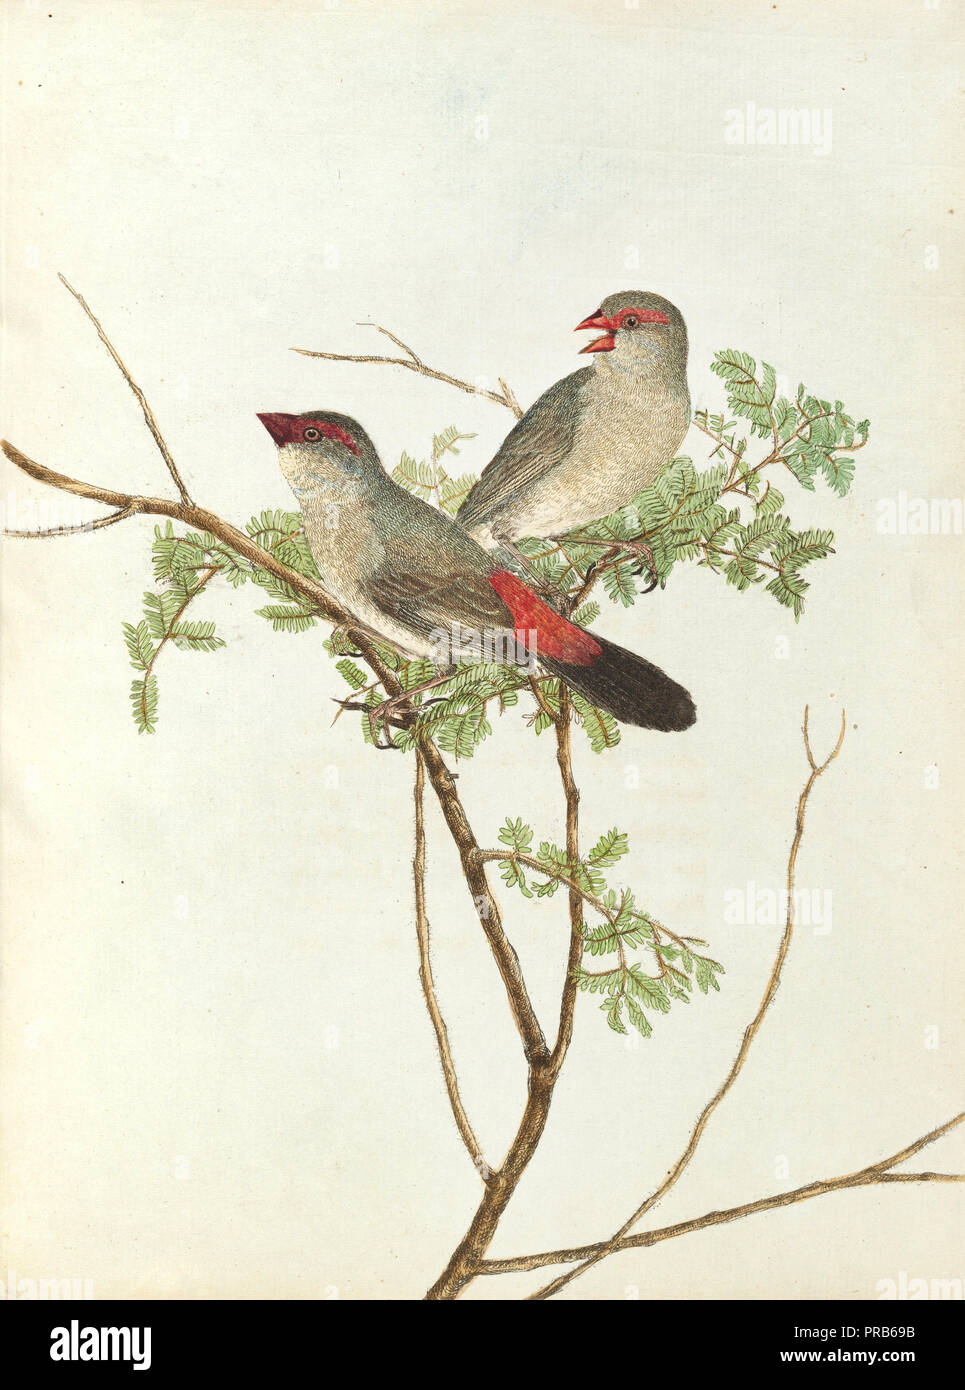 John Lewin, Common Grossbeak, 1805 Print, National Gallery of Australia, Canberra, Australia. - Stock Image